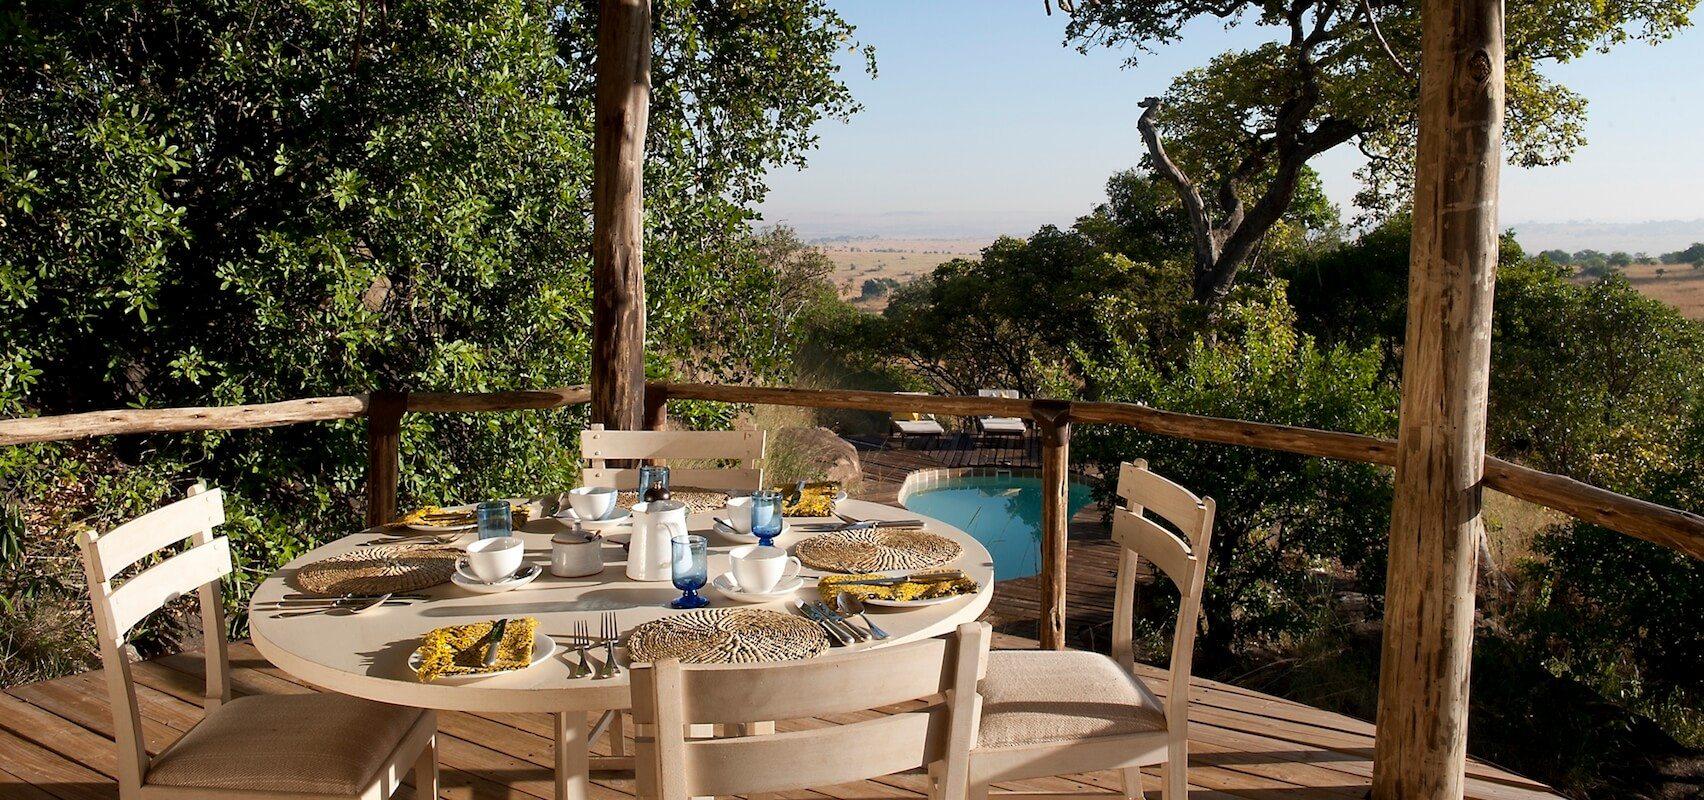 Tanzania_NorthSerengeti_Nomad Lamai Serengeti Private Lodge Dining